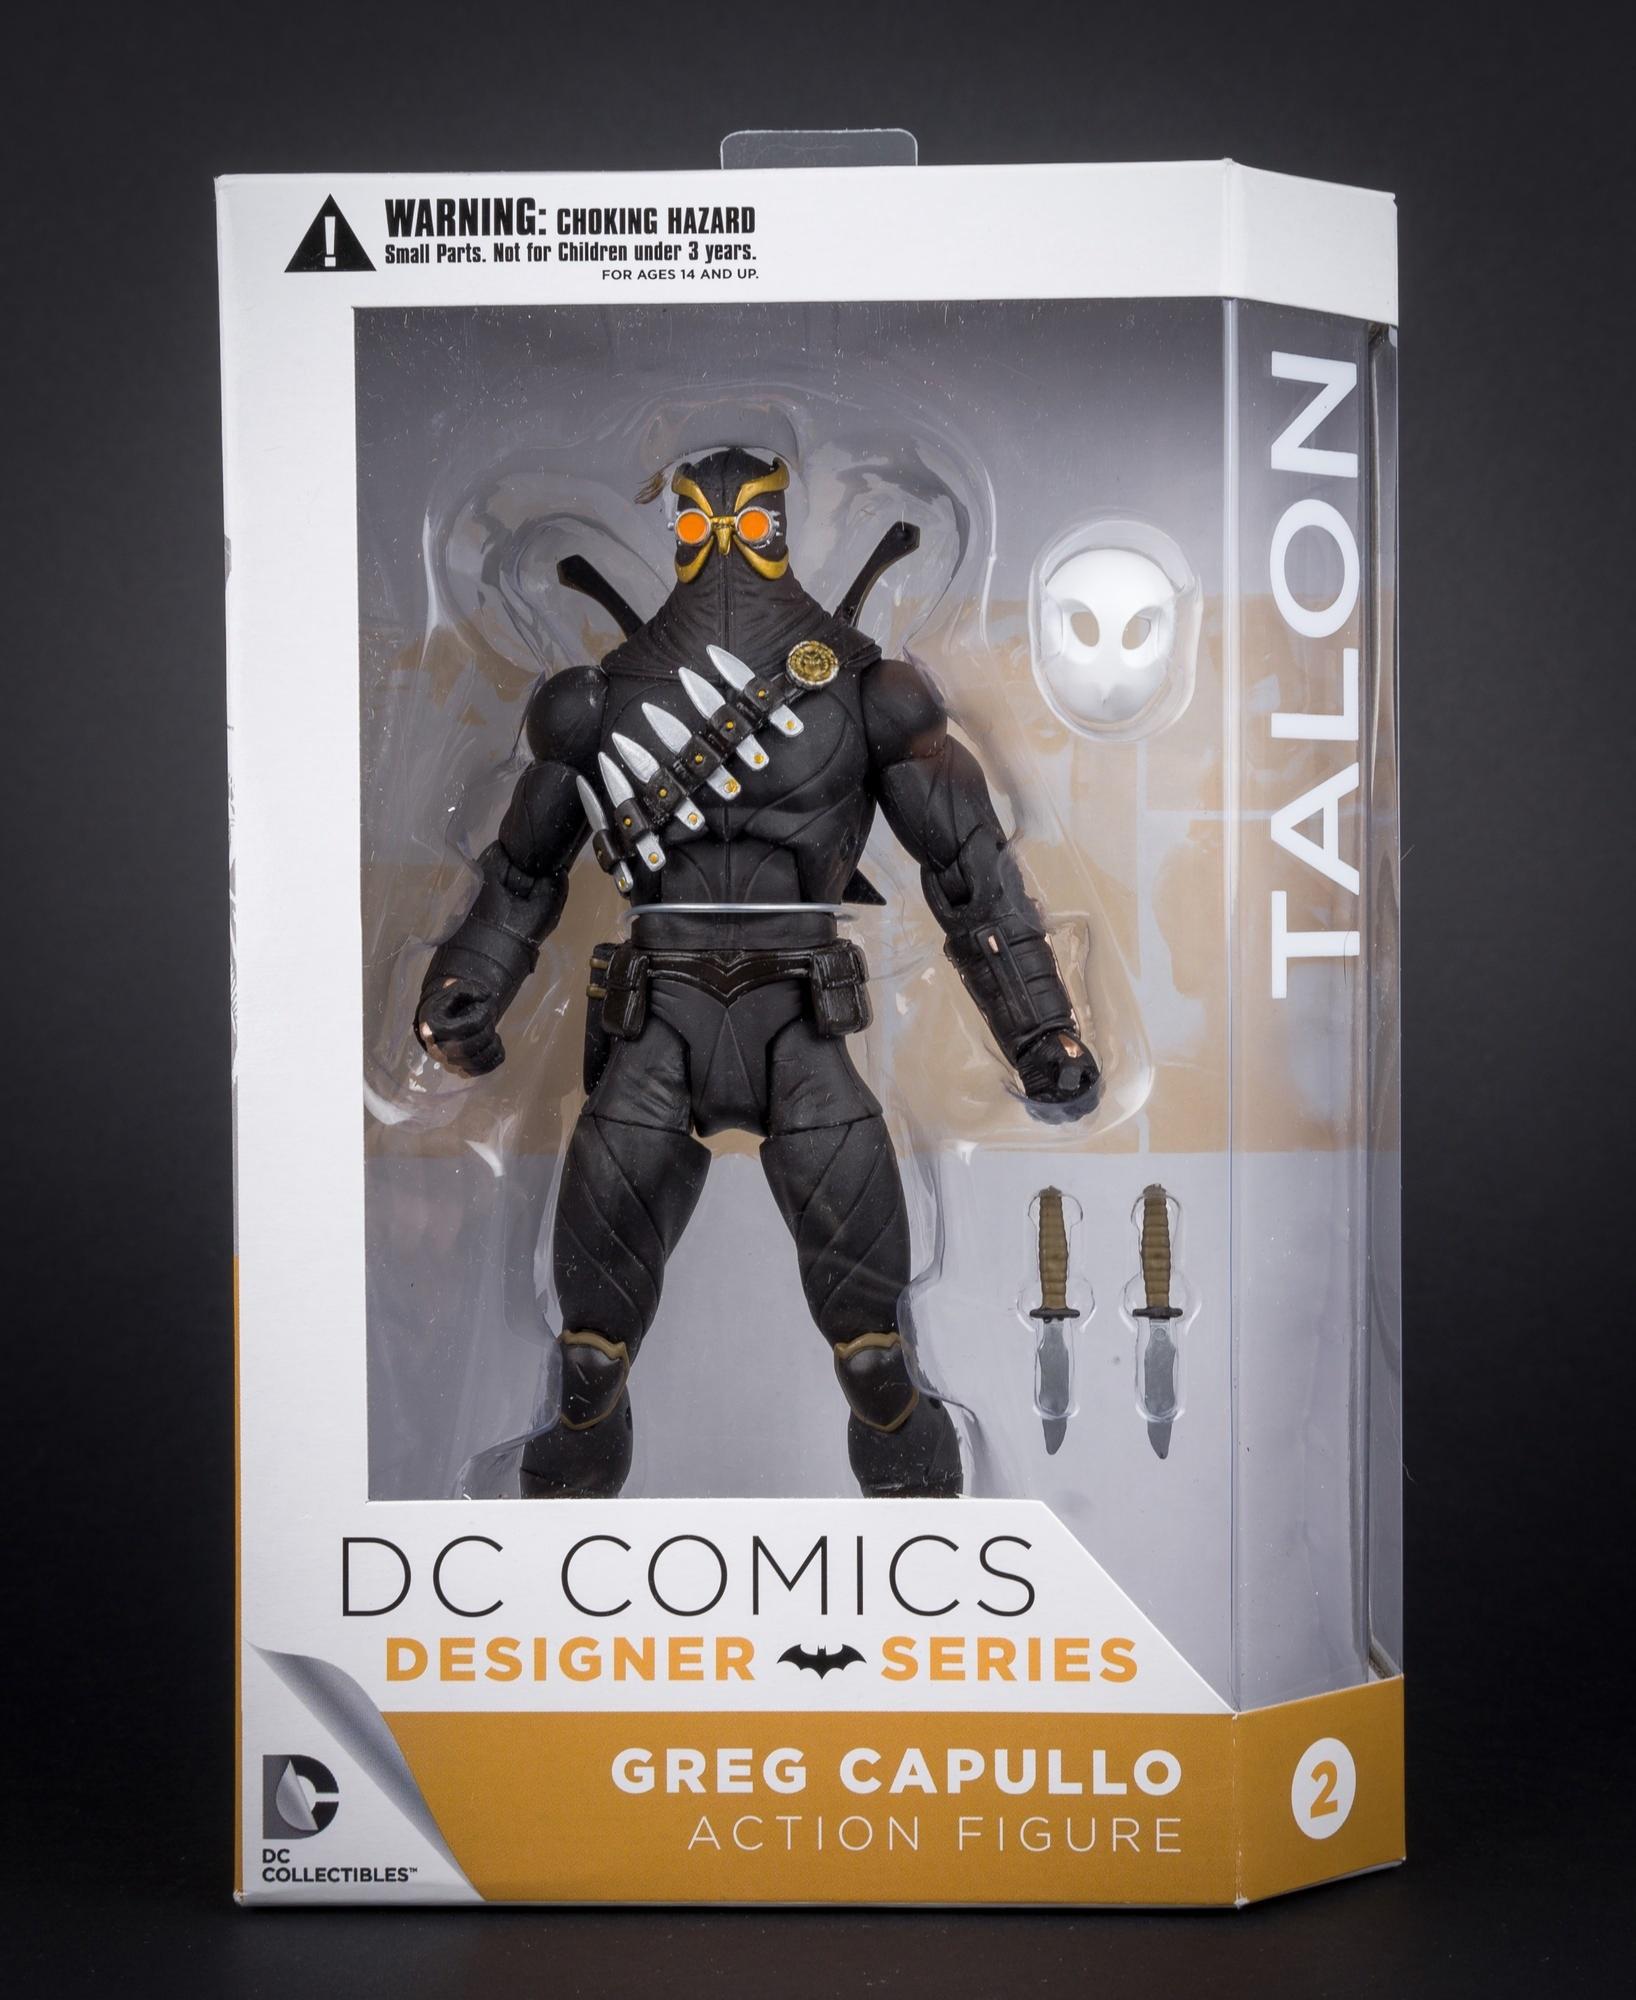 DC Comics Designer Series 01 By Greg Capullo - Talon